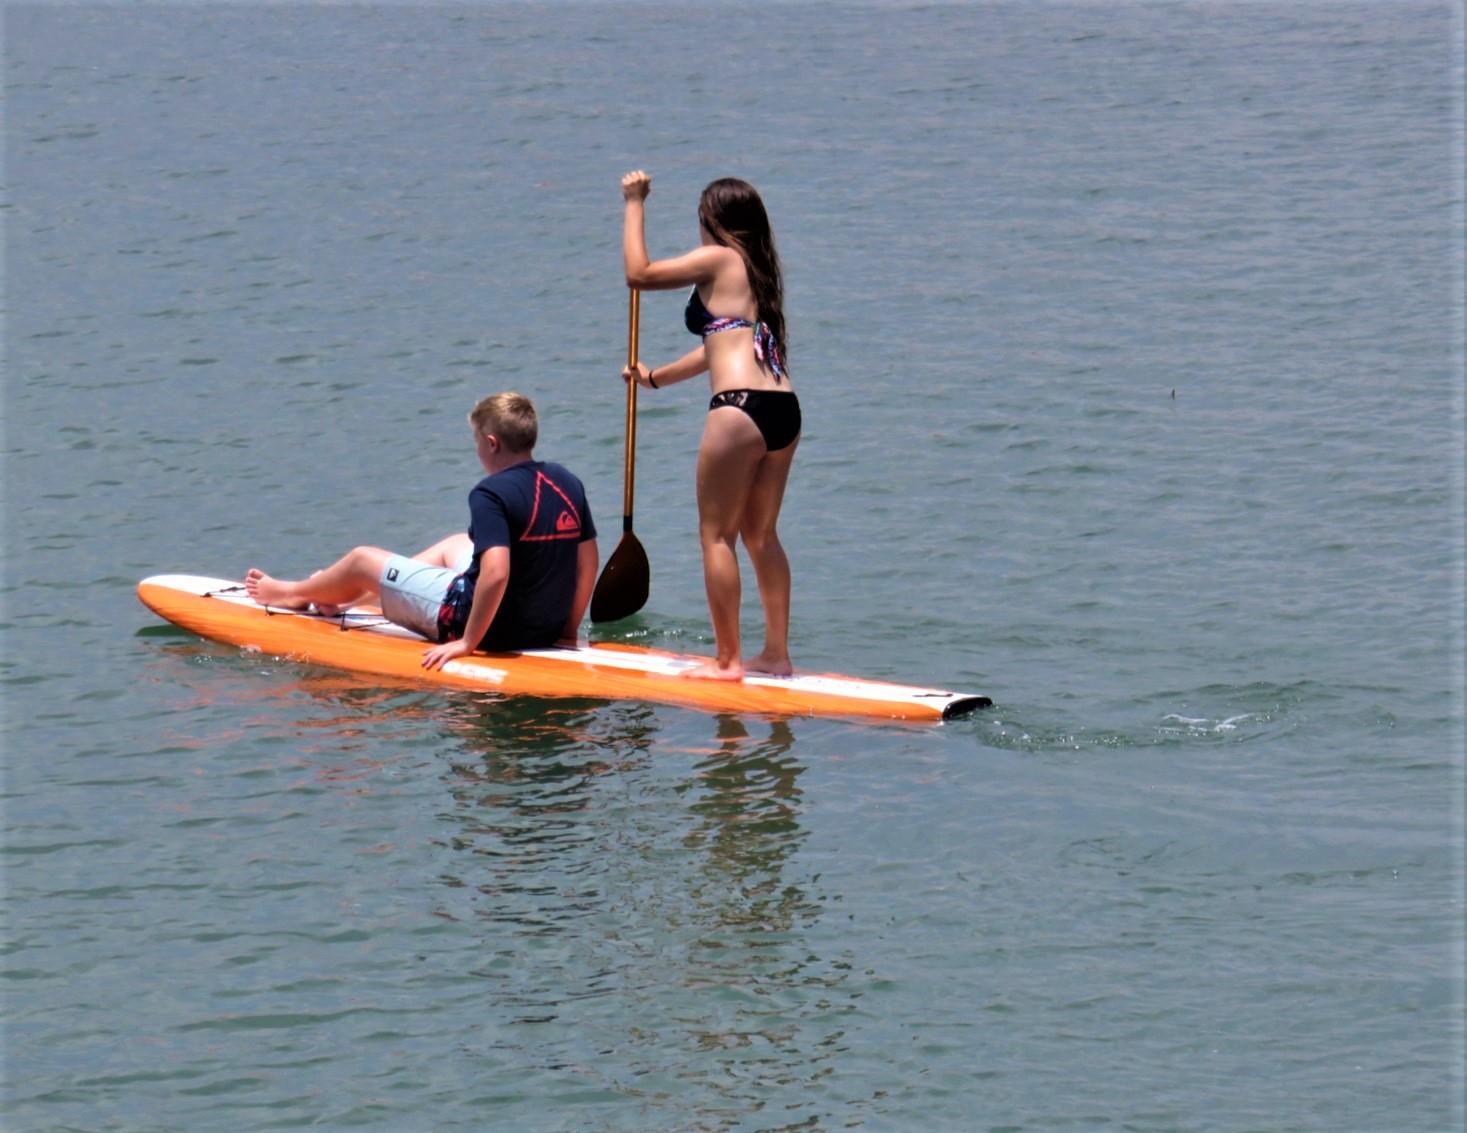 8.Newport beach paddle boarding